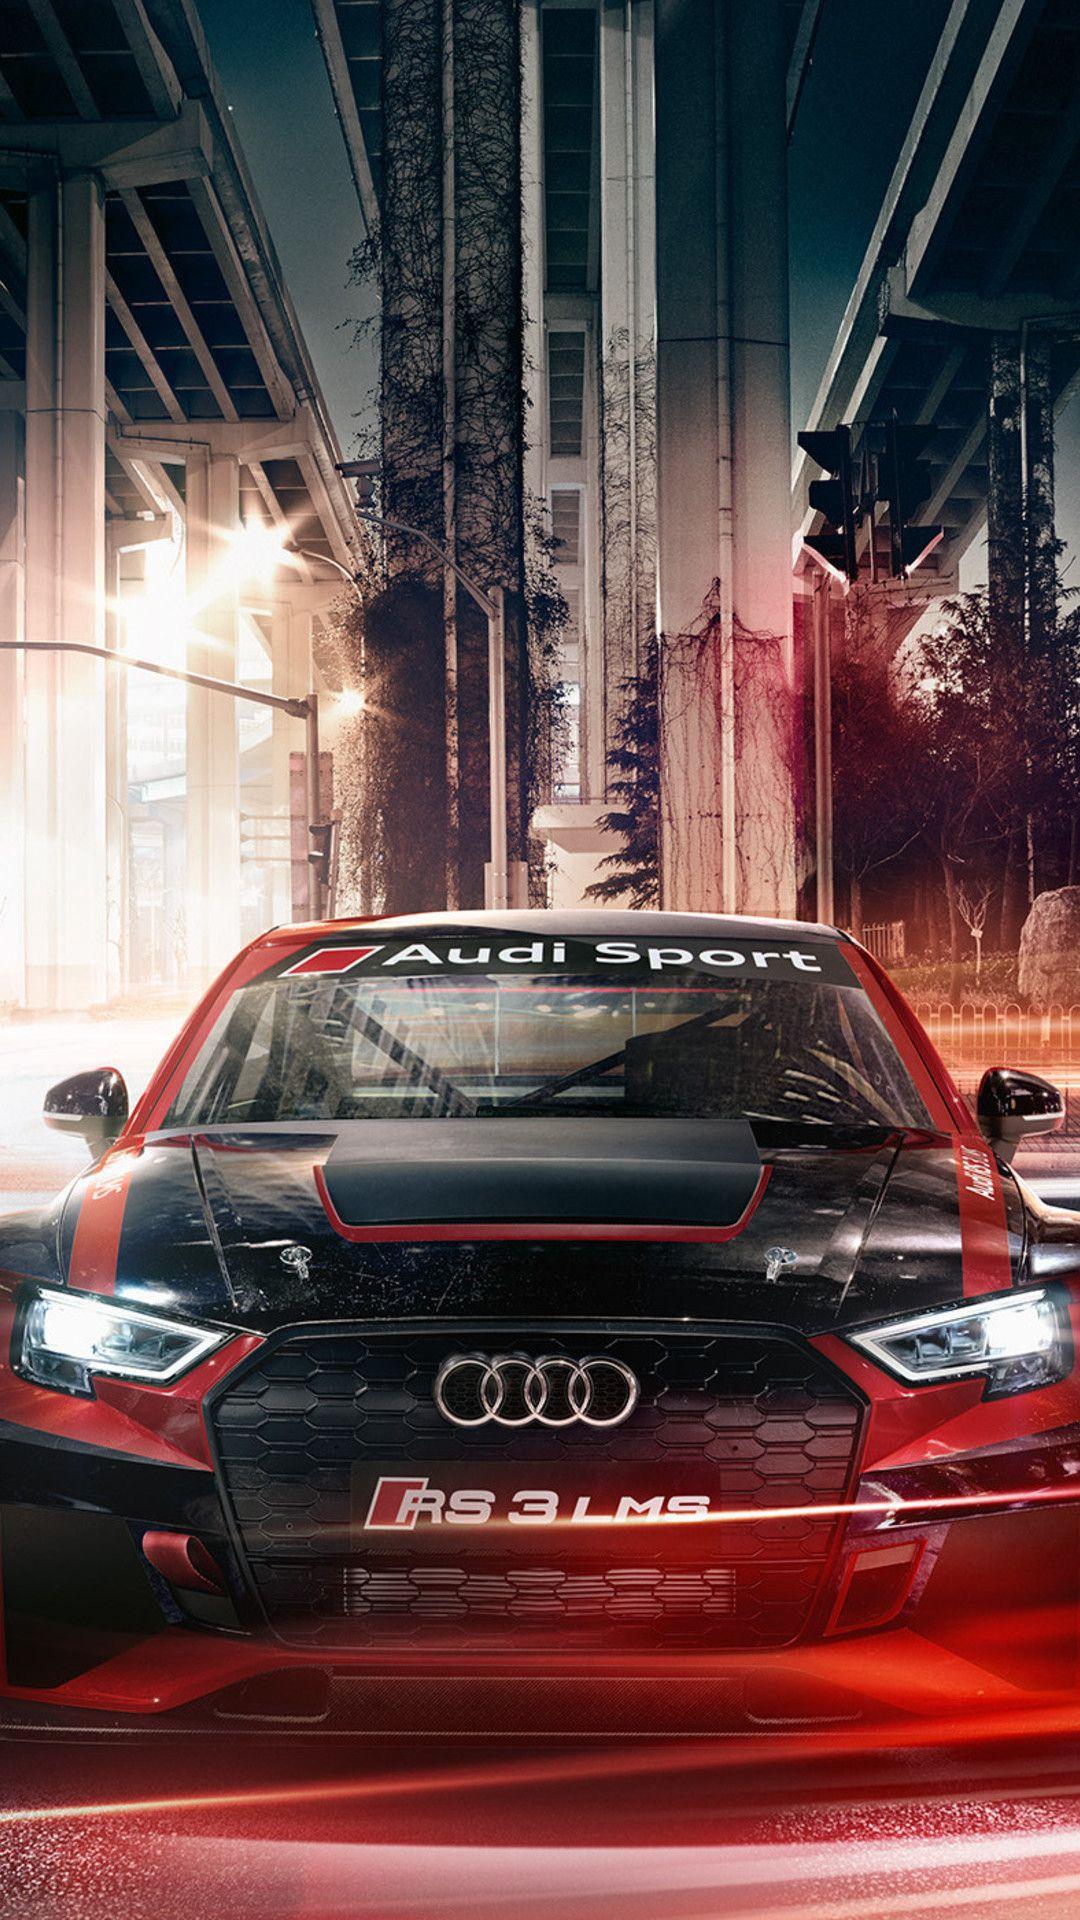 Audi Rs 3 In 1080x1920 Resolution Audi Rs Luxury Cars Audi Audi